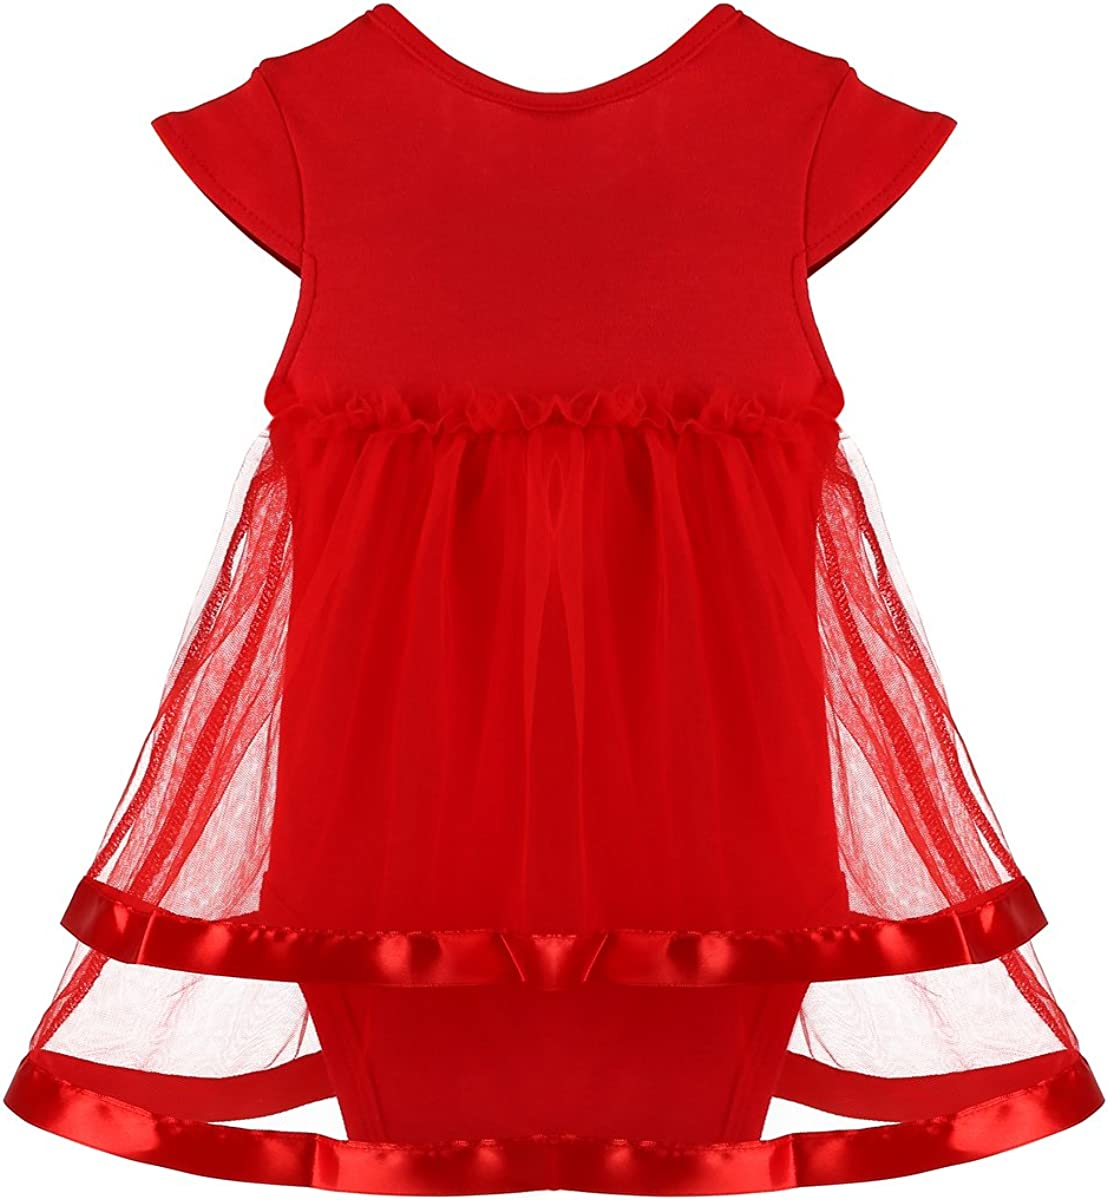 inSowni 3pcs Baby Girl Bodysuit Dress with Flower Headband & Barefoot Sandals